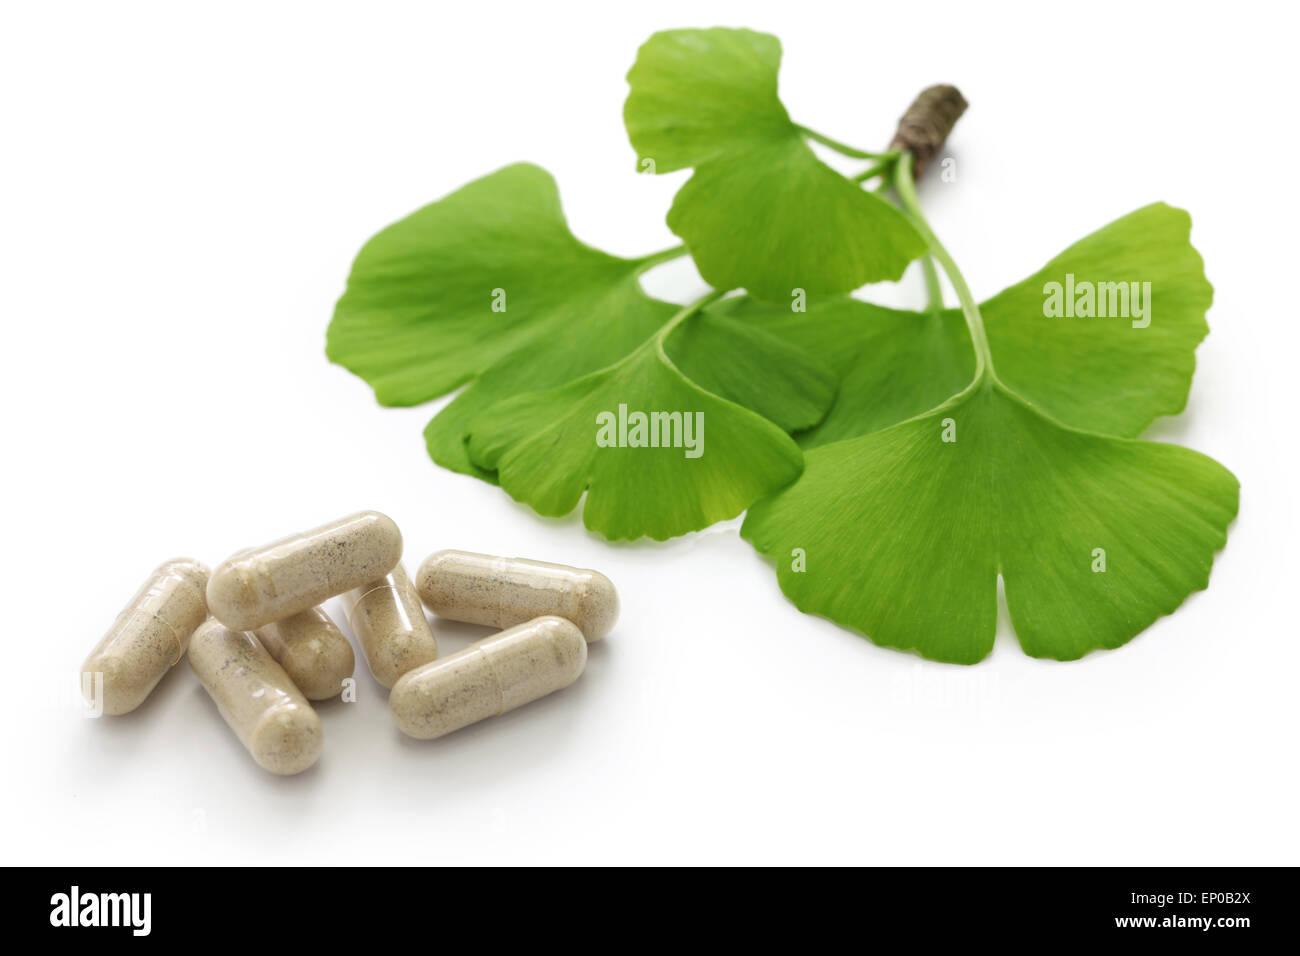 ginkgo biloba leaves and medicine capsule pills - Stock Image